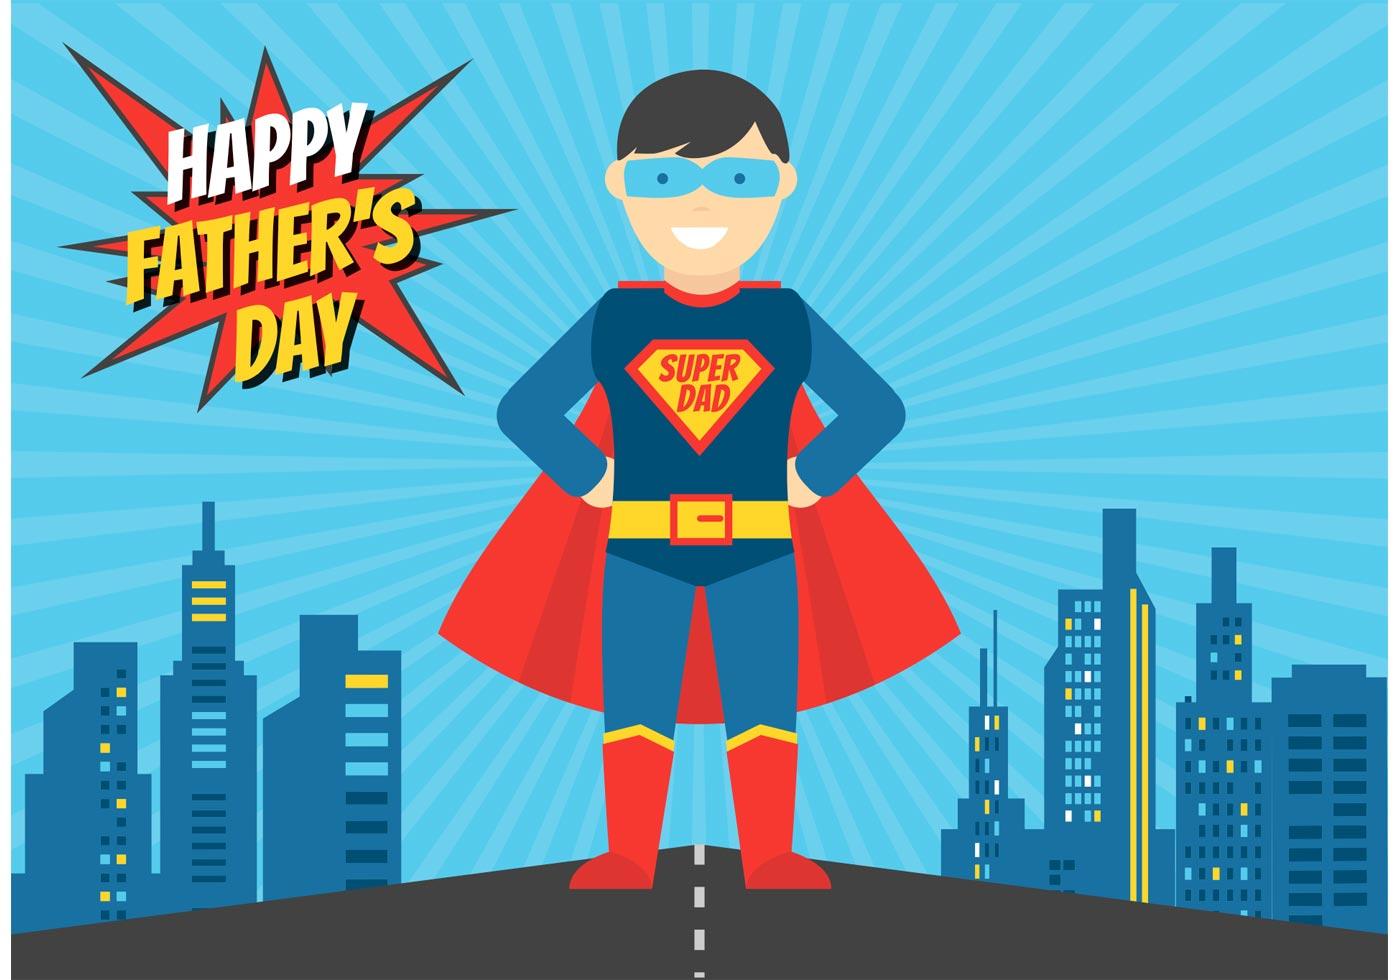 Superhero Dad Vector Illustration - Download Free Vector Art, Stock  Graphics & Images